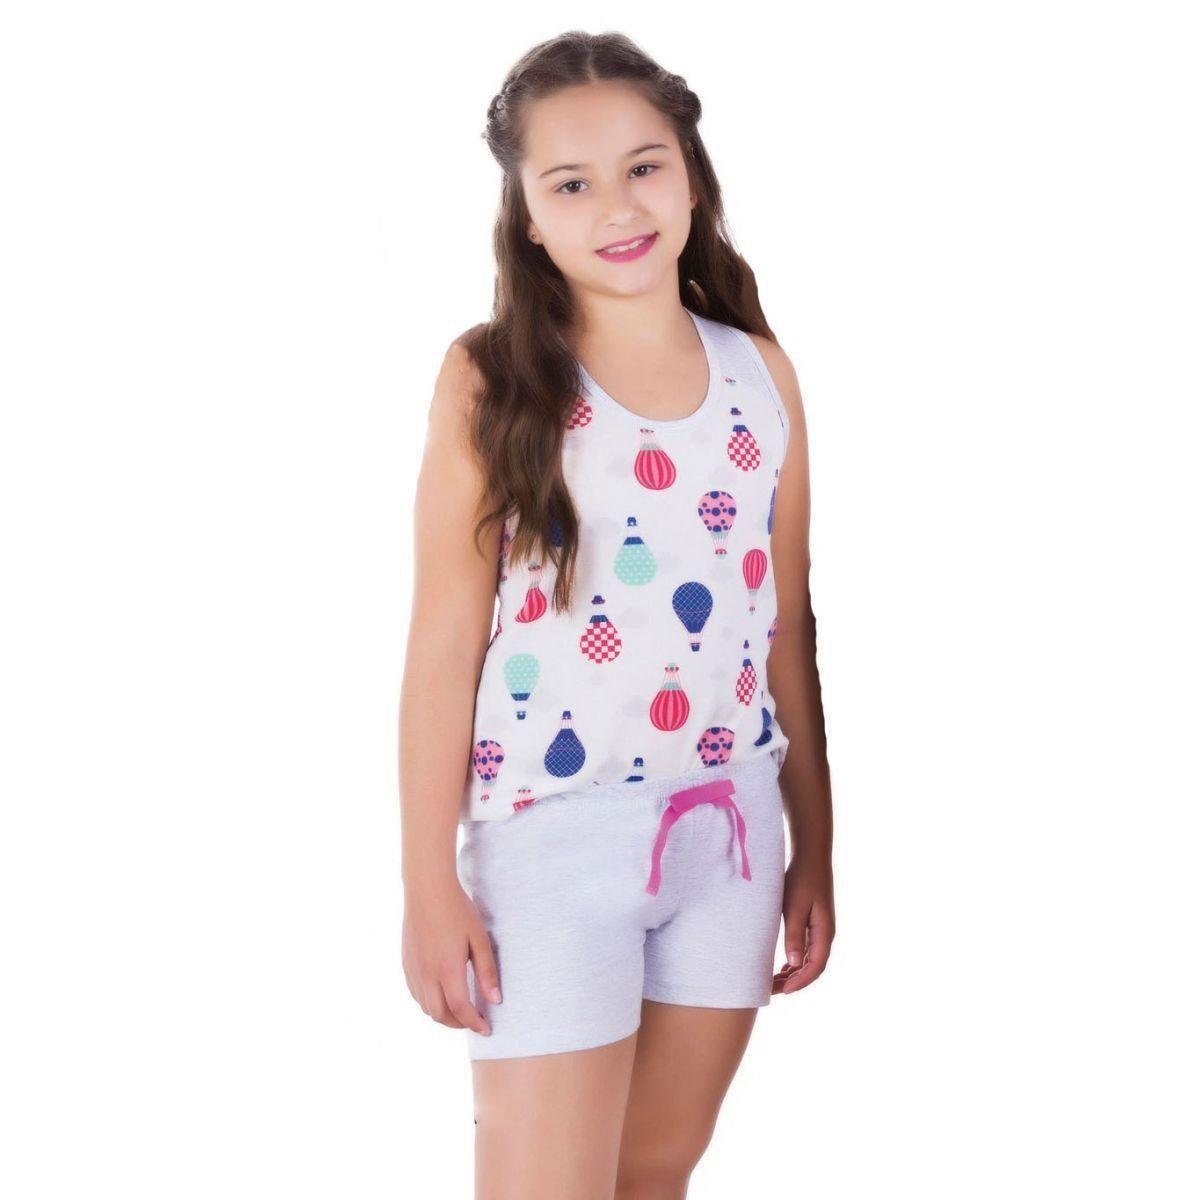 Pijama infantil verão feminino Victory